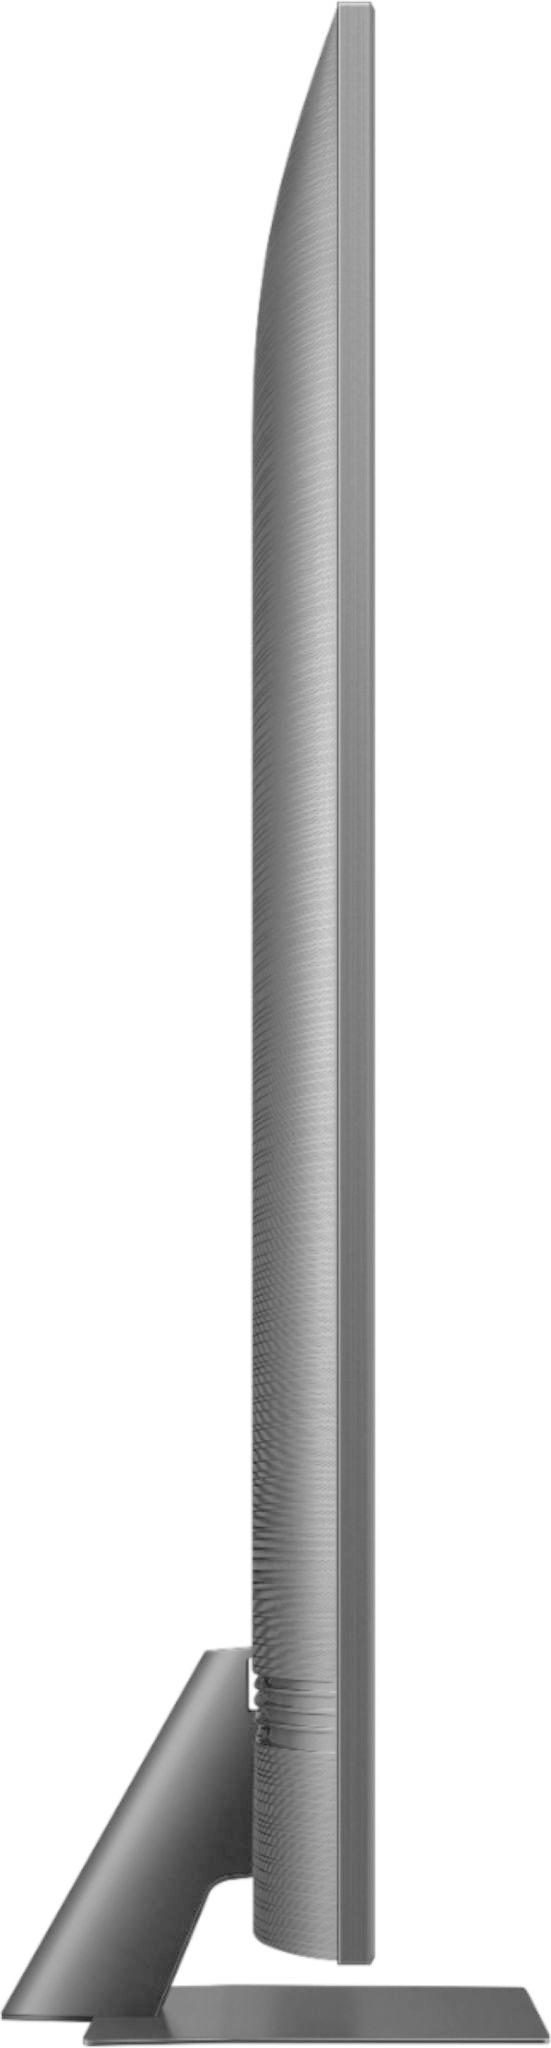 Samsung Q80 Series QLED 4K Ultra HD HDR Smart TV